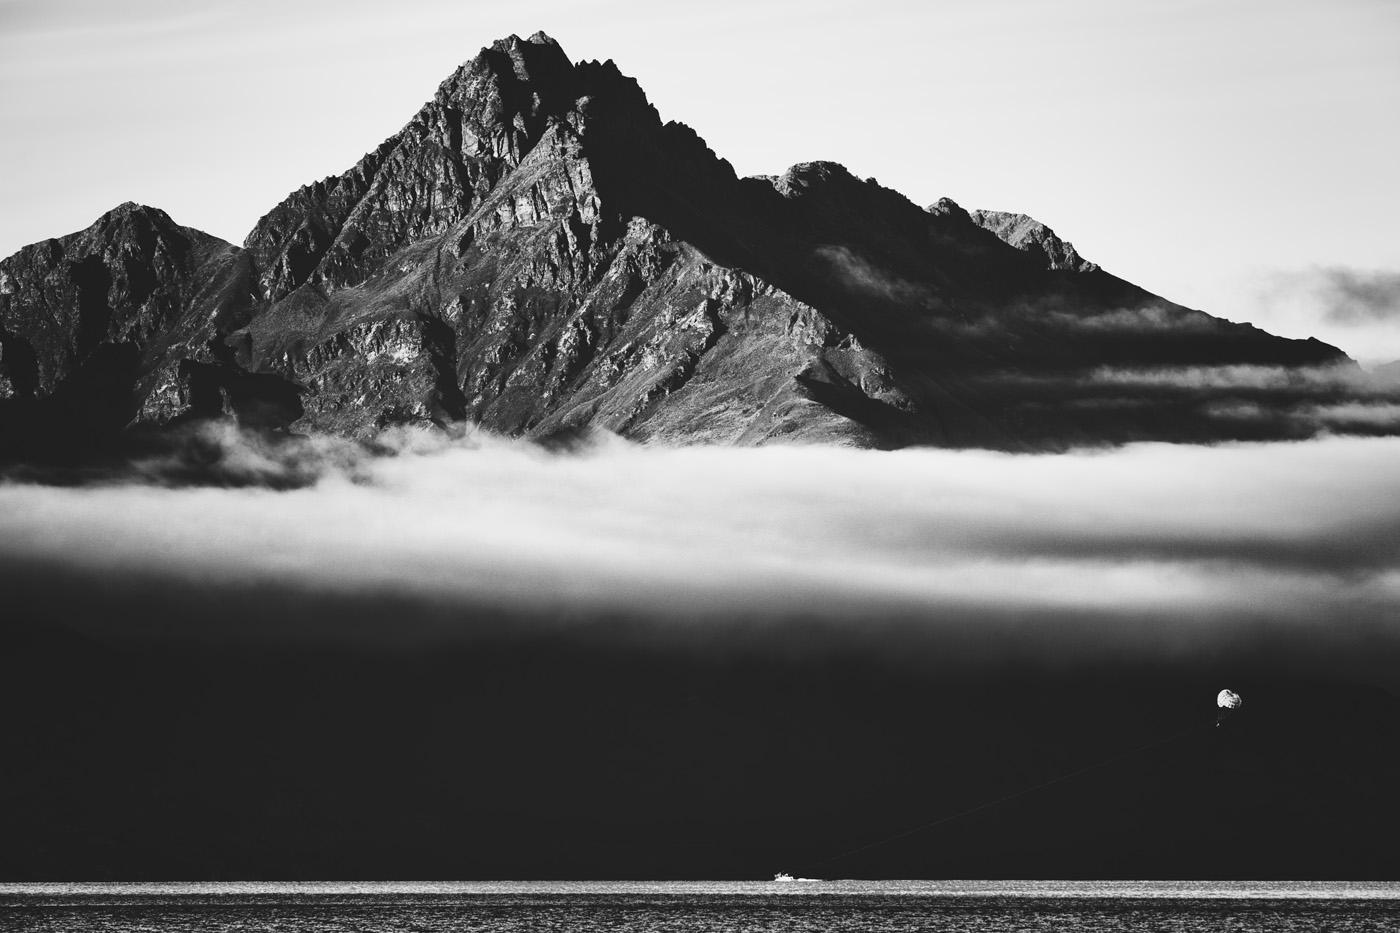 Parasailing on Lake Wakatipu | 2015